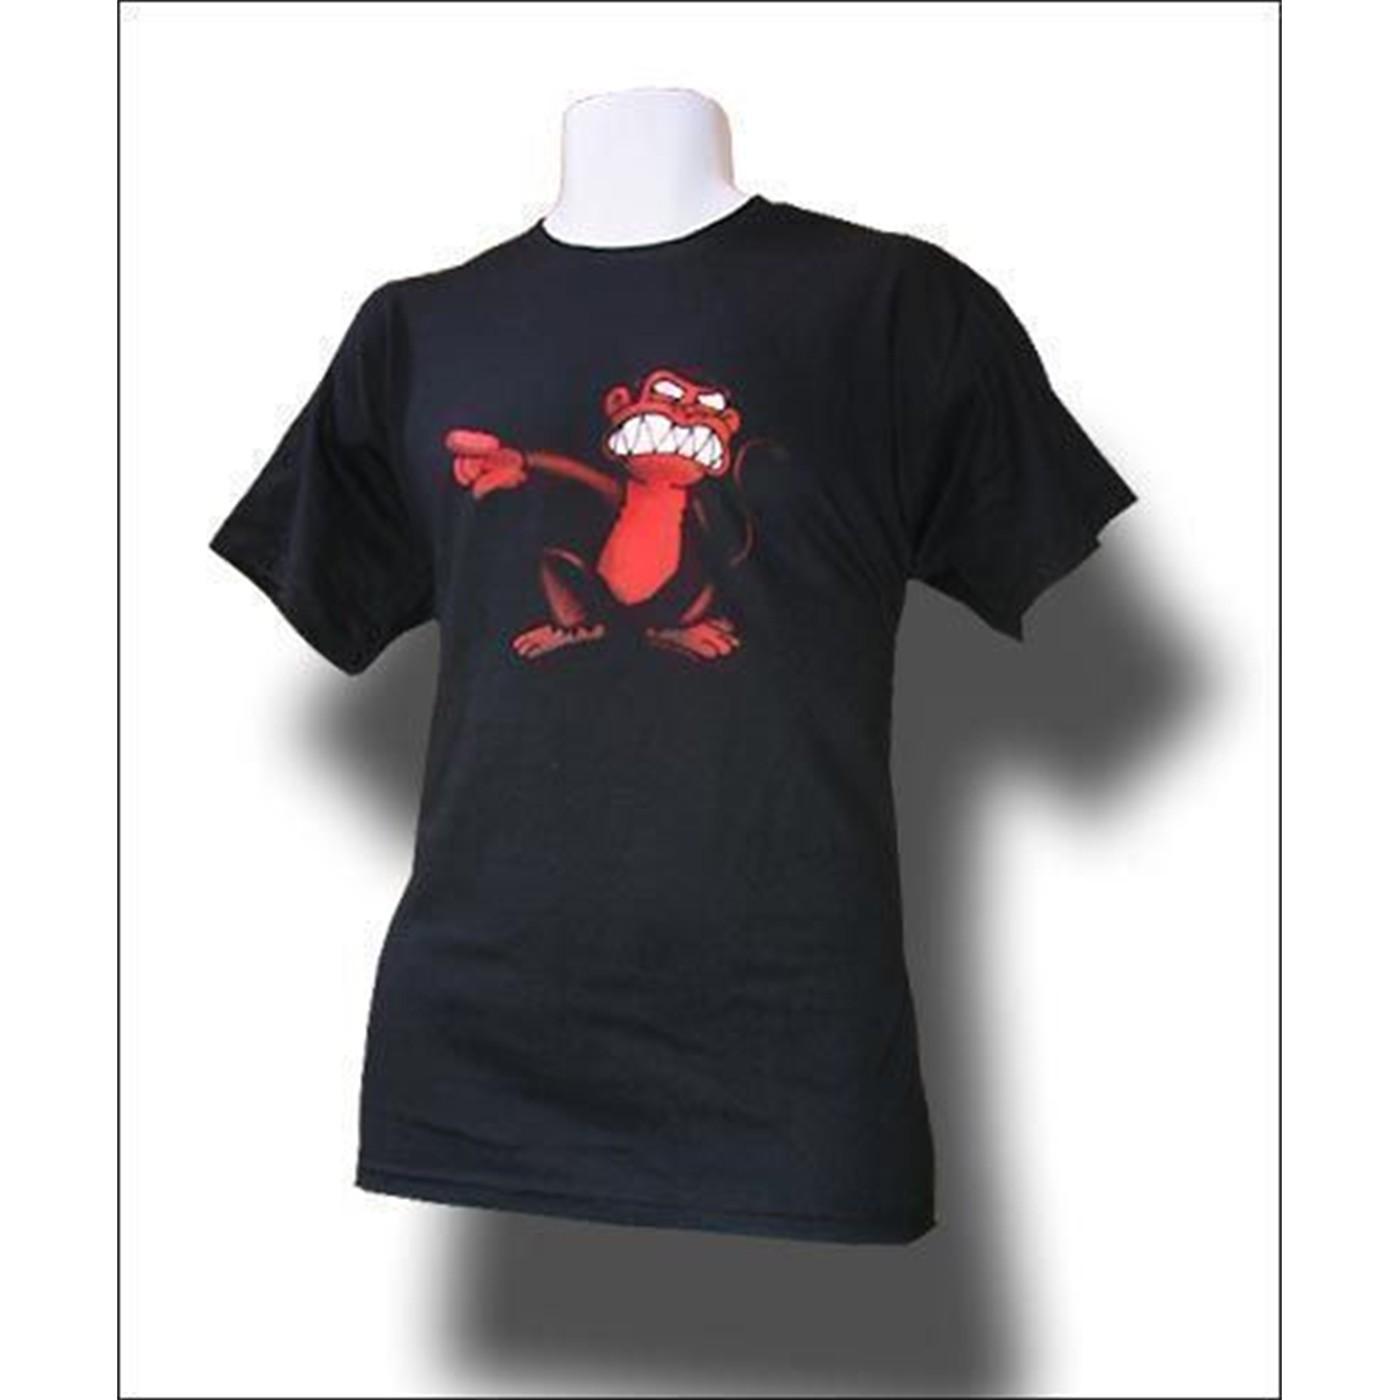 Red Evil Monkey t-shirt